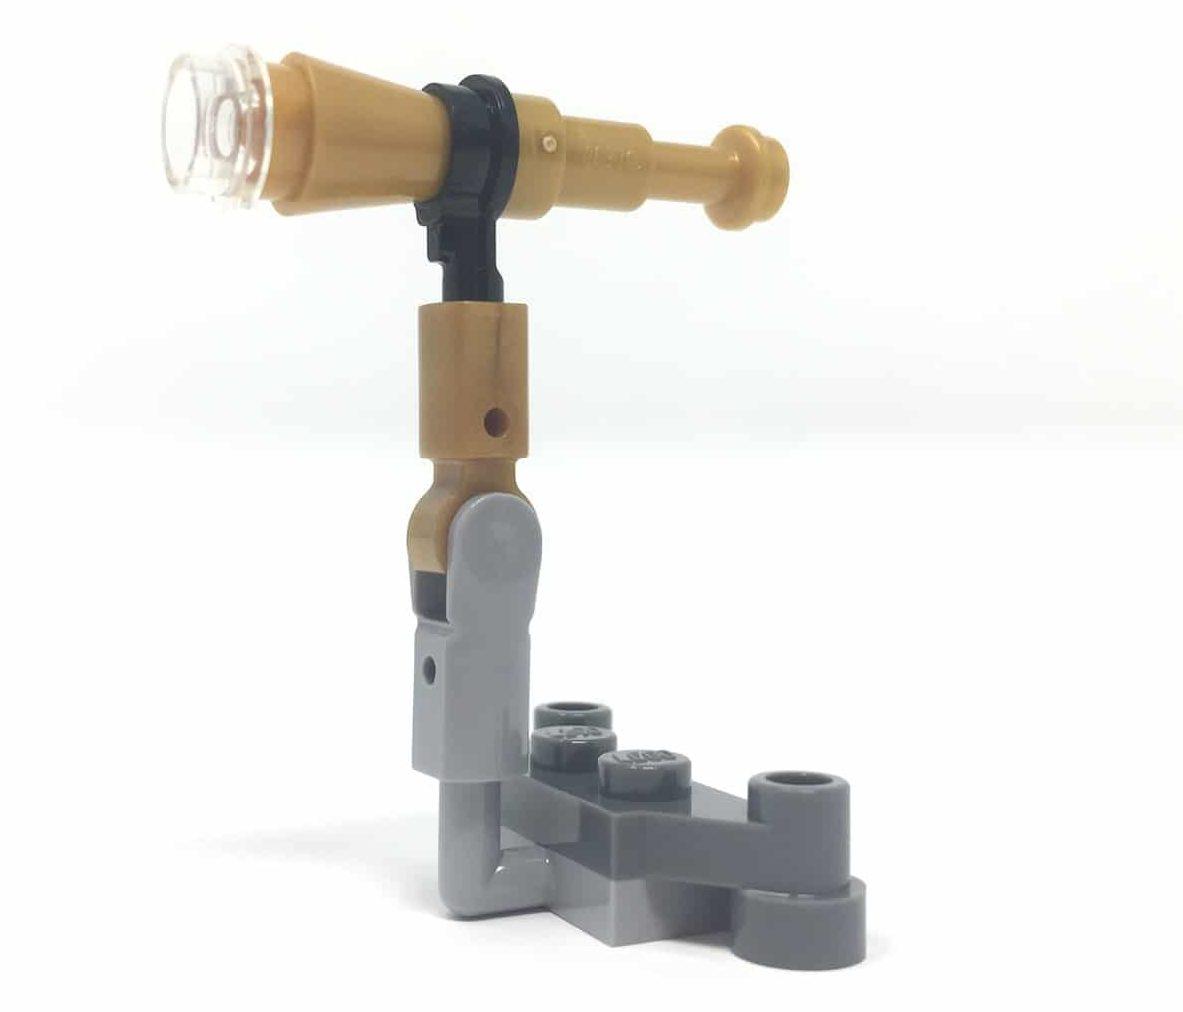 LEGO 60235 City Adventskalender 2019 Tür 21